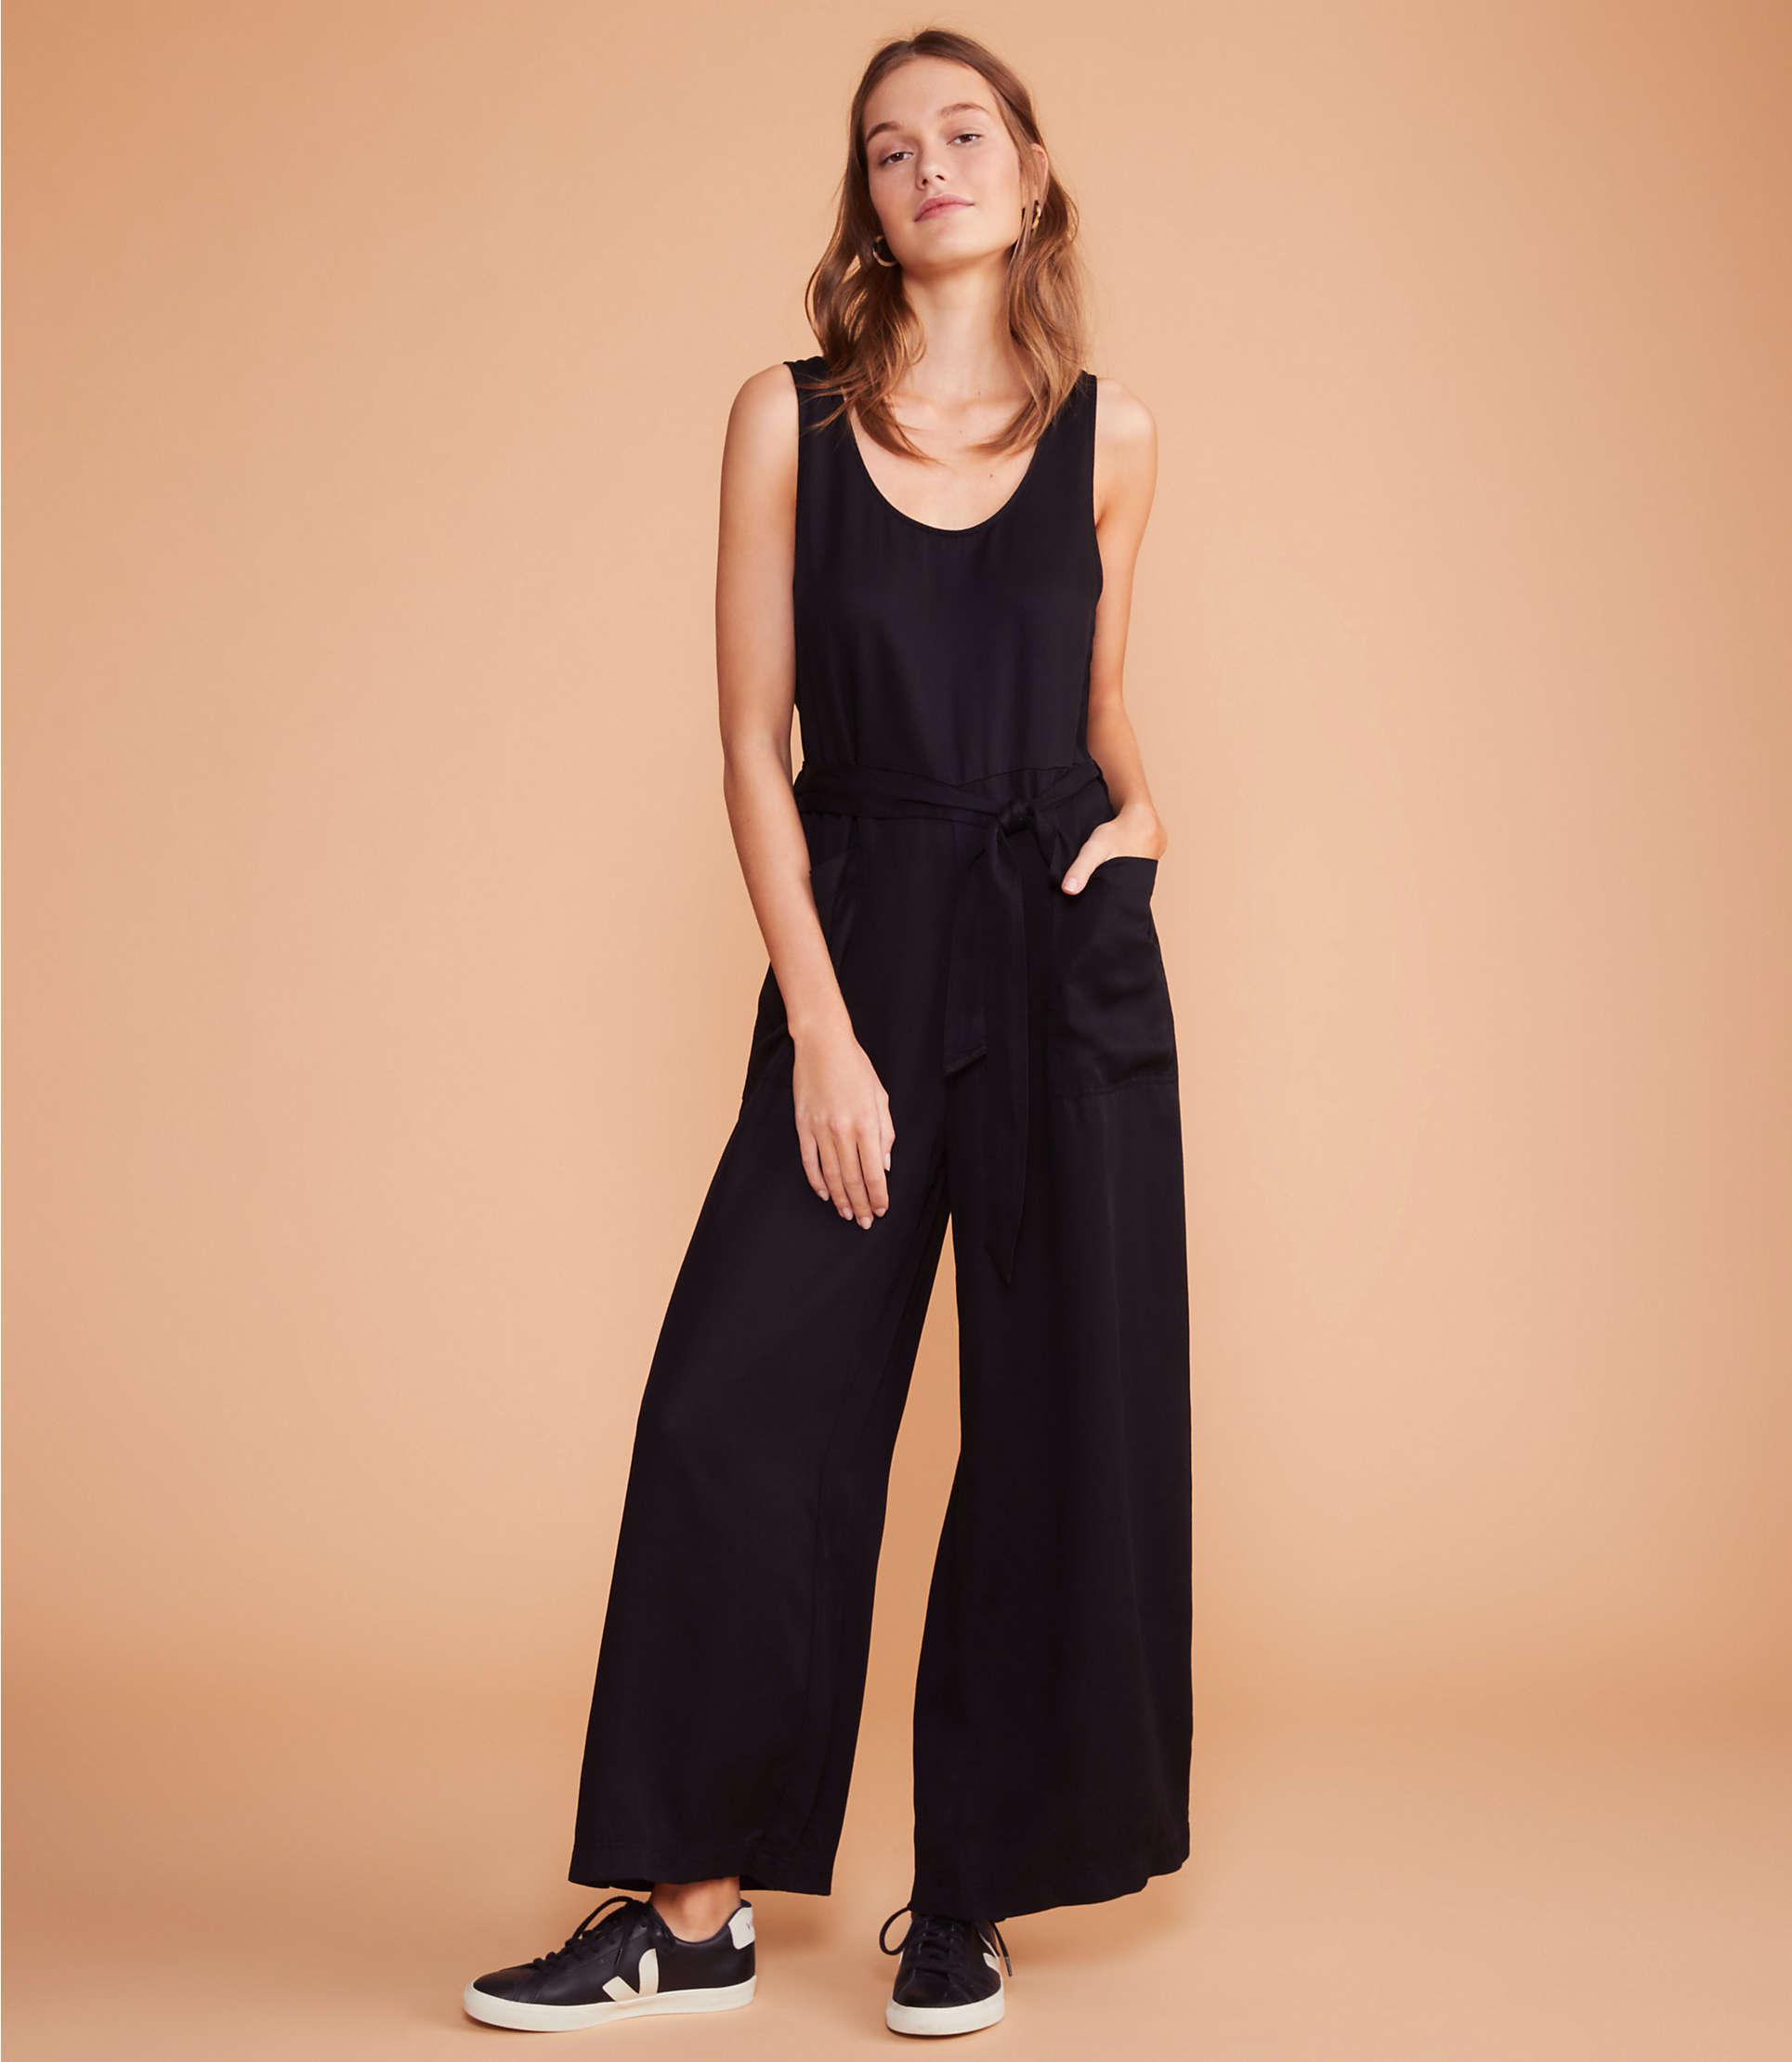 293ec78e5eb Lyst - LOFT Lou   Grey Fluid Twill Tie Waist Jumpsuit in Black